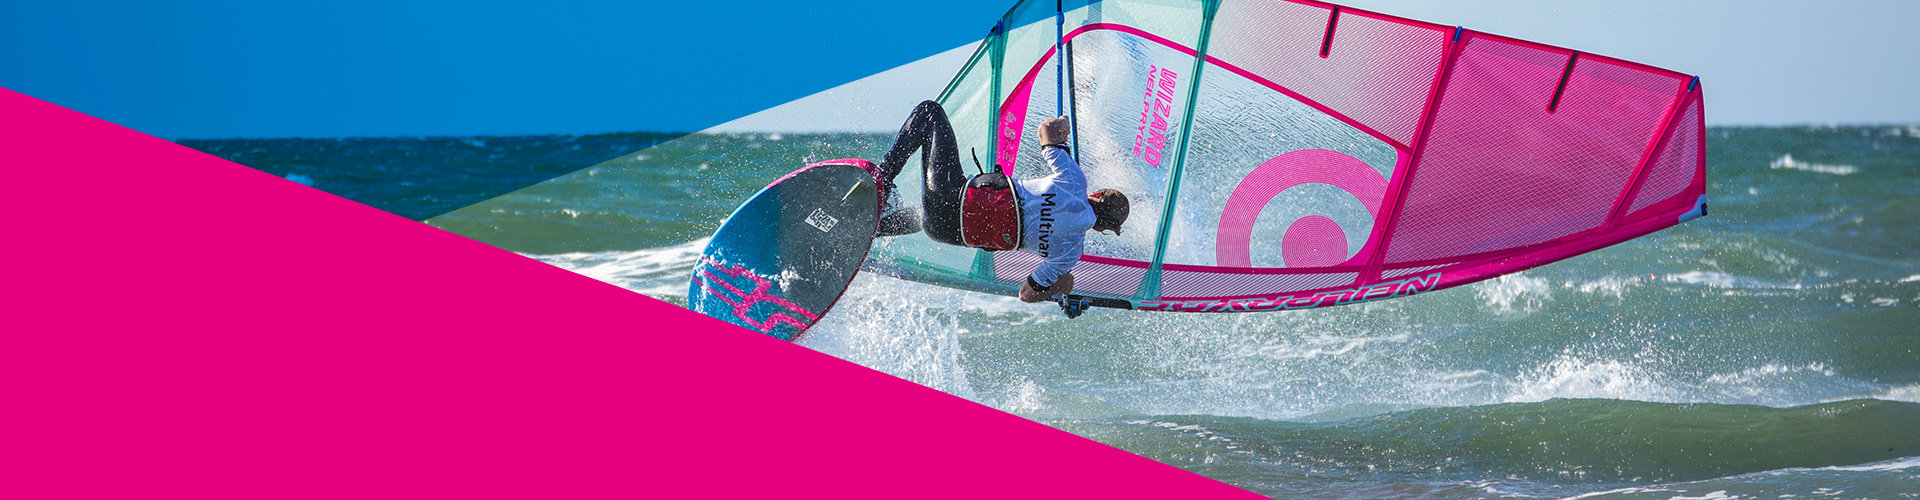 dwc_Windsurfcup_Kleiner Header_About 3_l